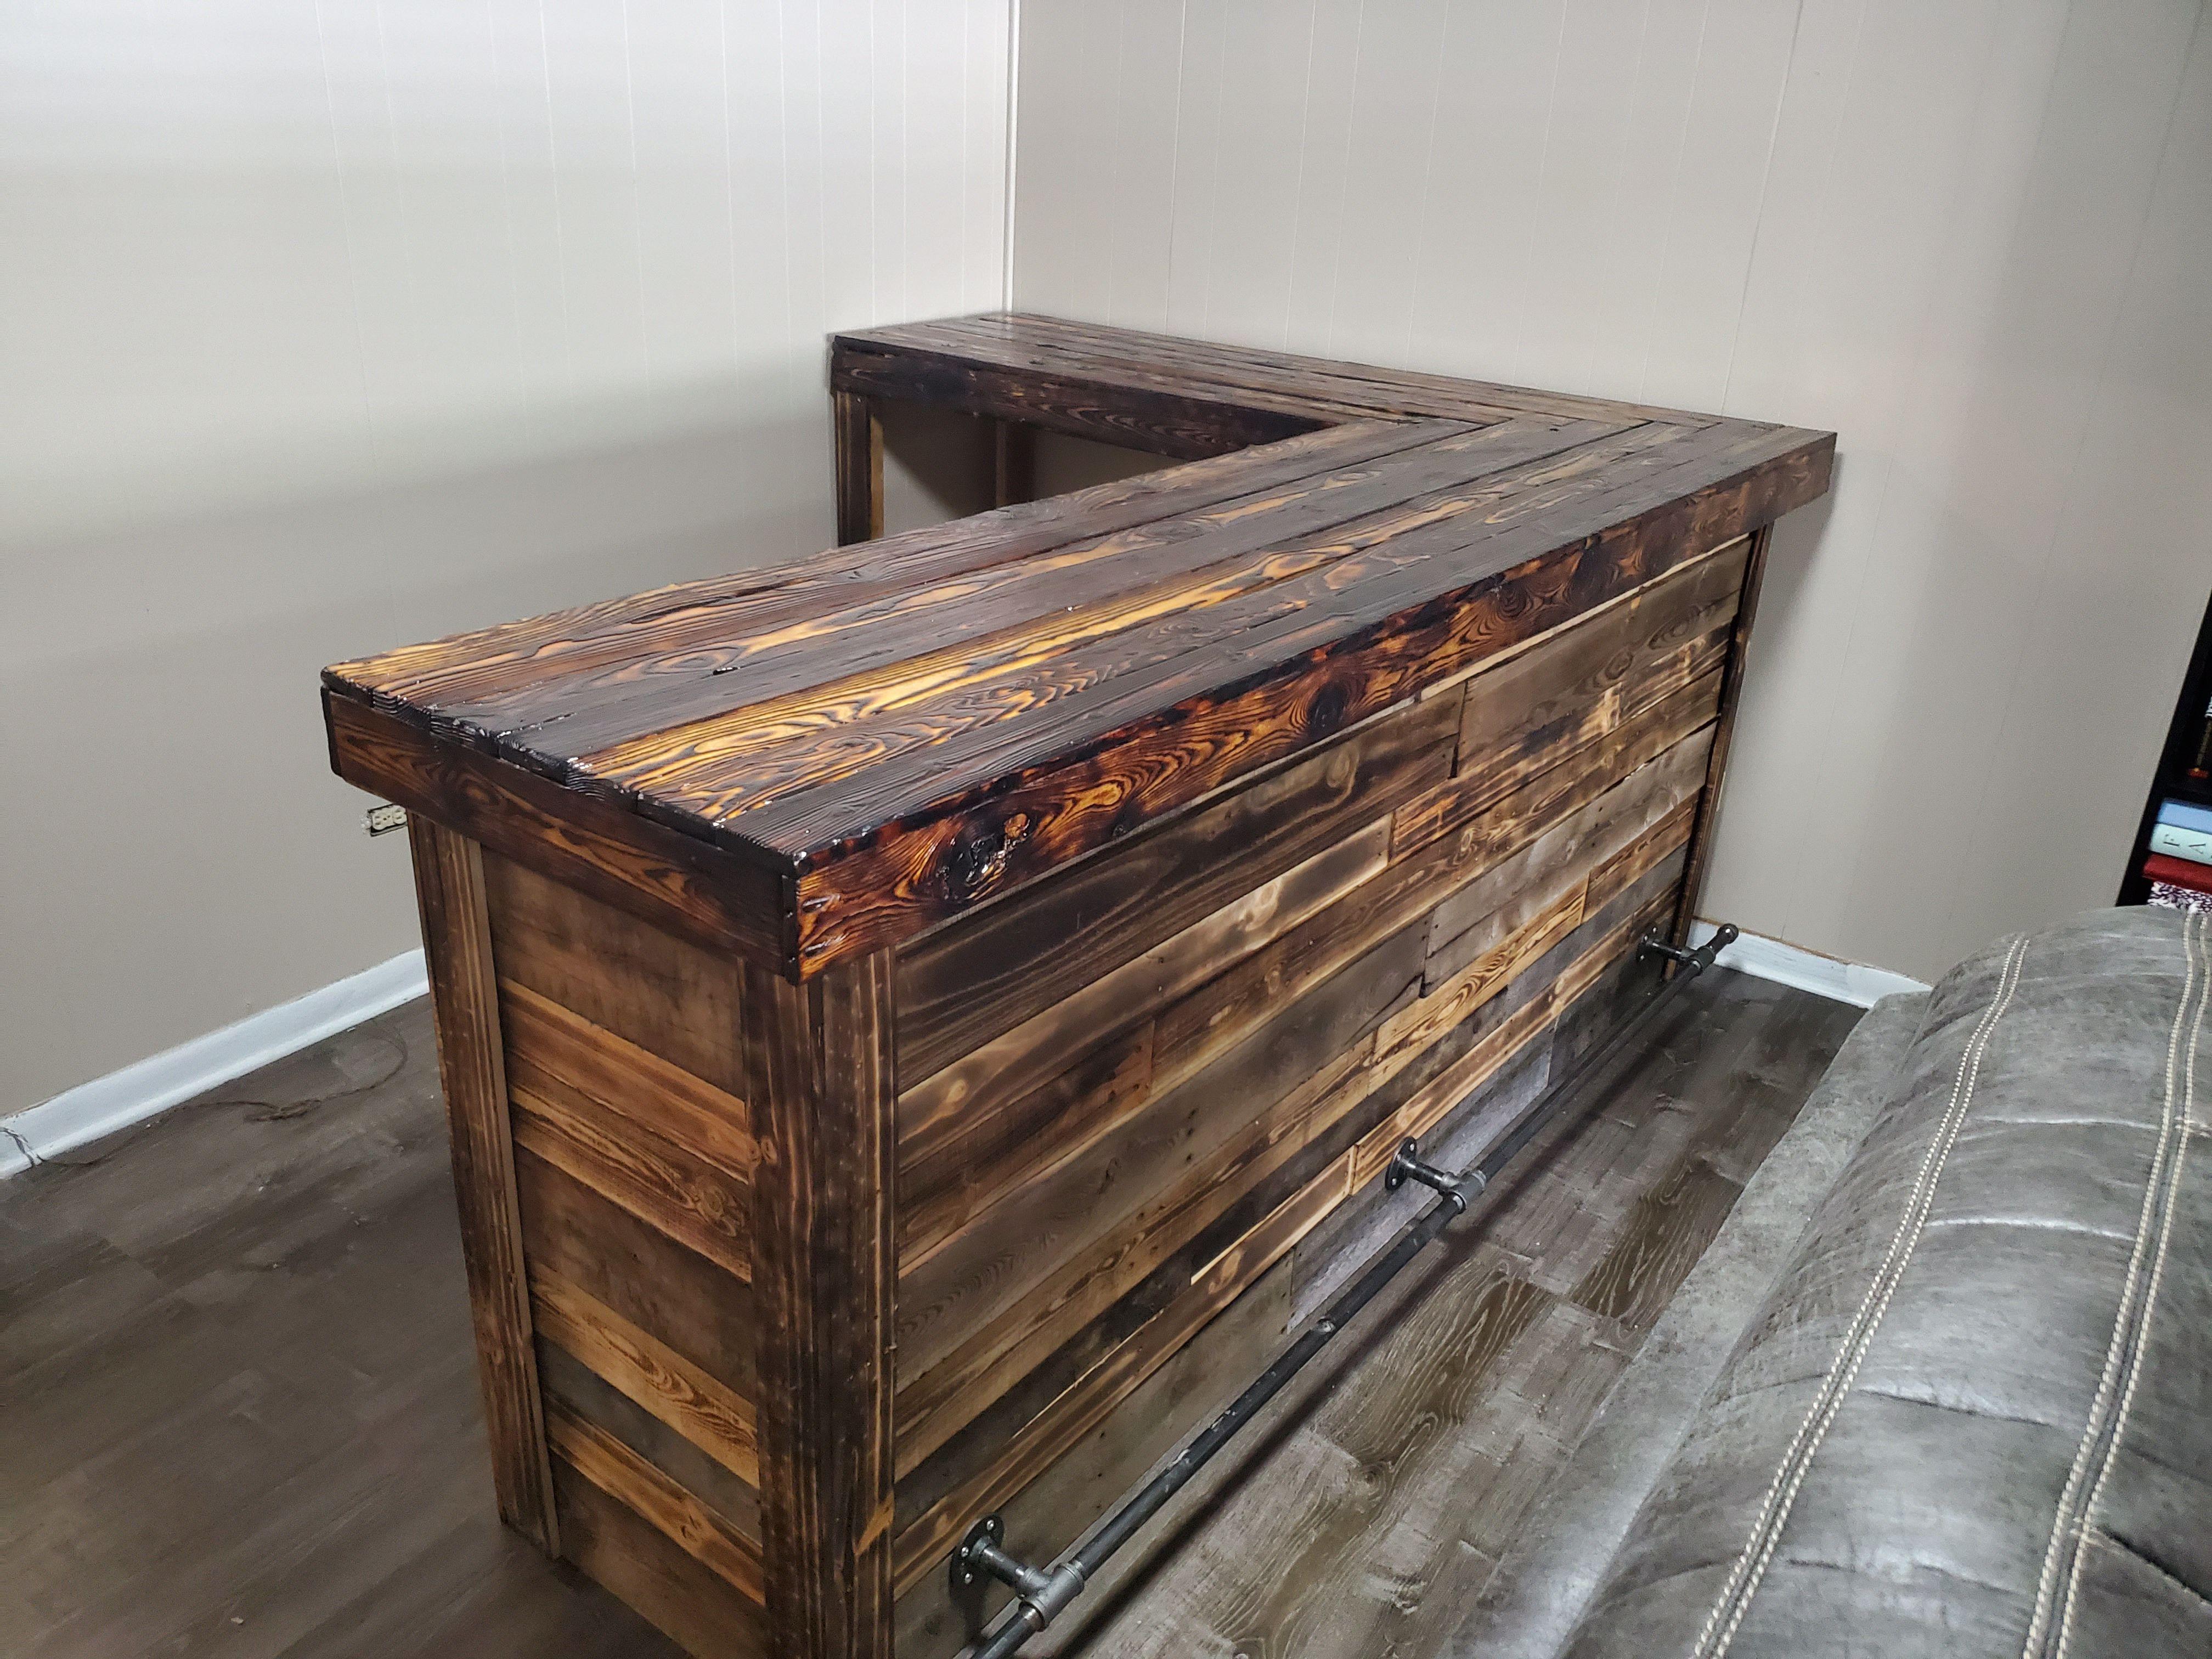 L Shaped Bar With 5 Whiskey Barrels L Shaped Bar Wine Barrel Bars For Home